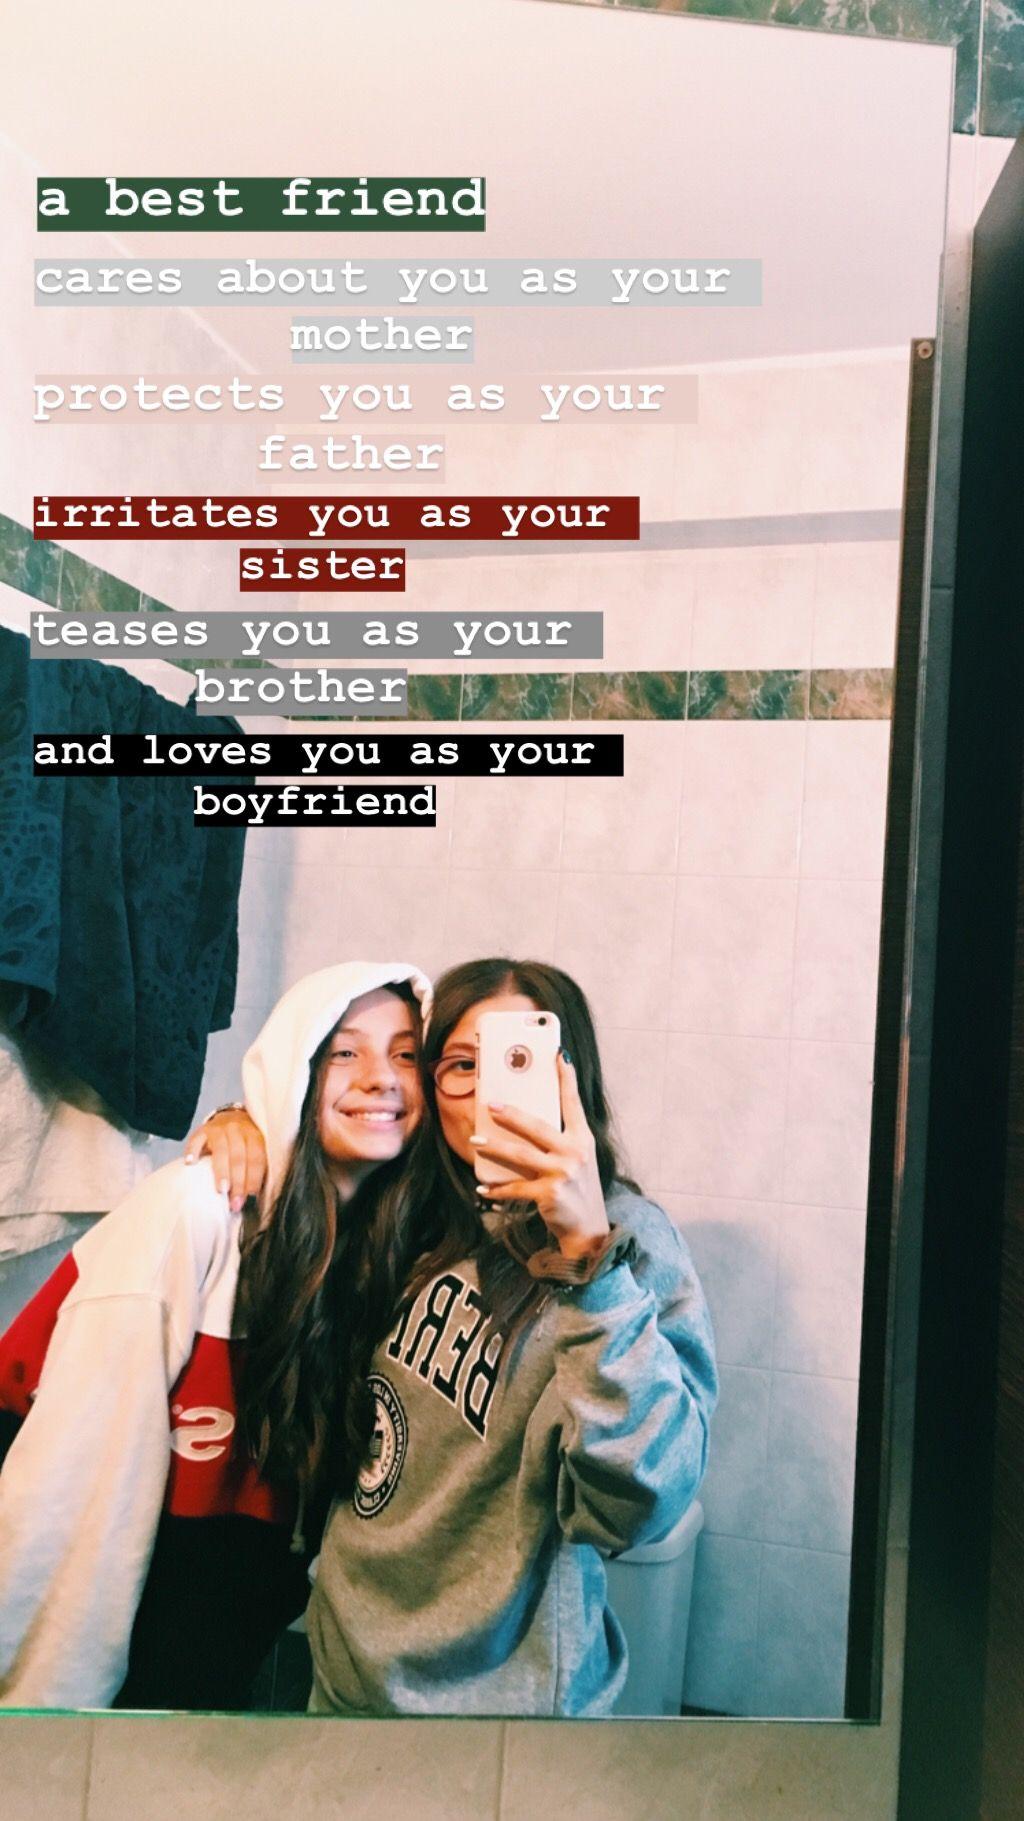 bestfriends   Instagram story ideas, Friends instagram, Instagram ...